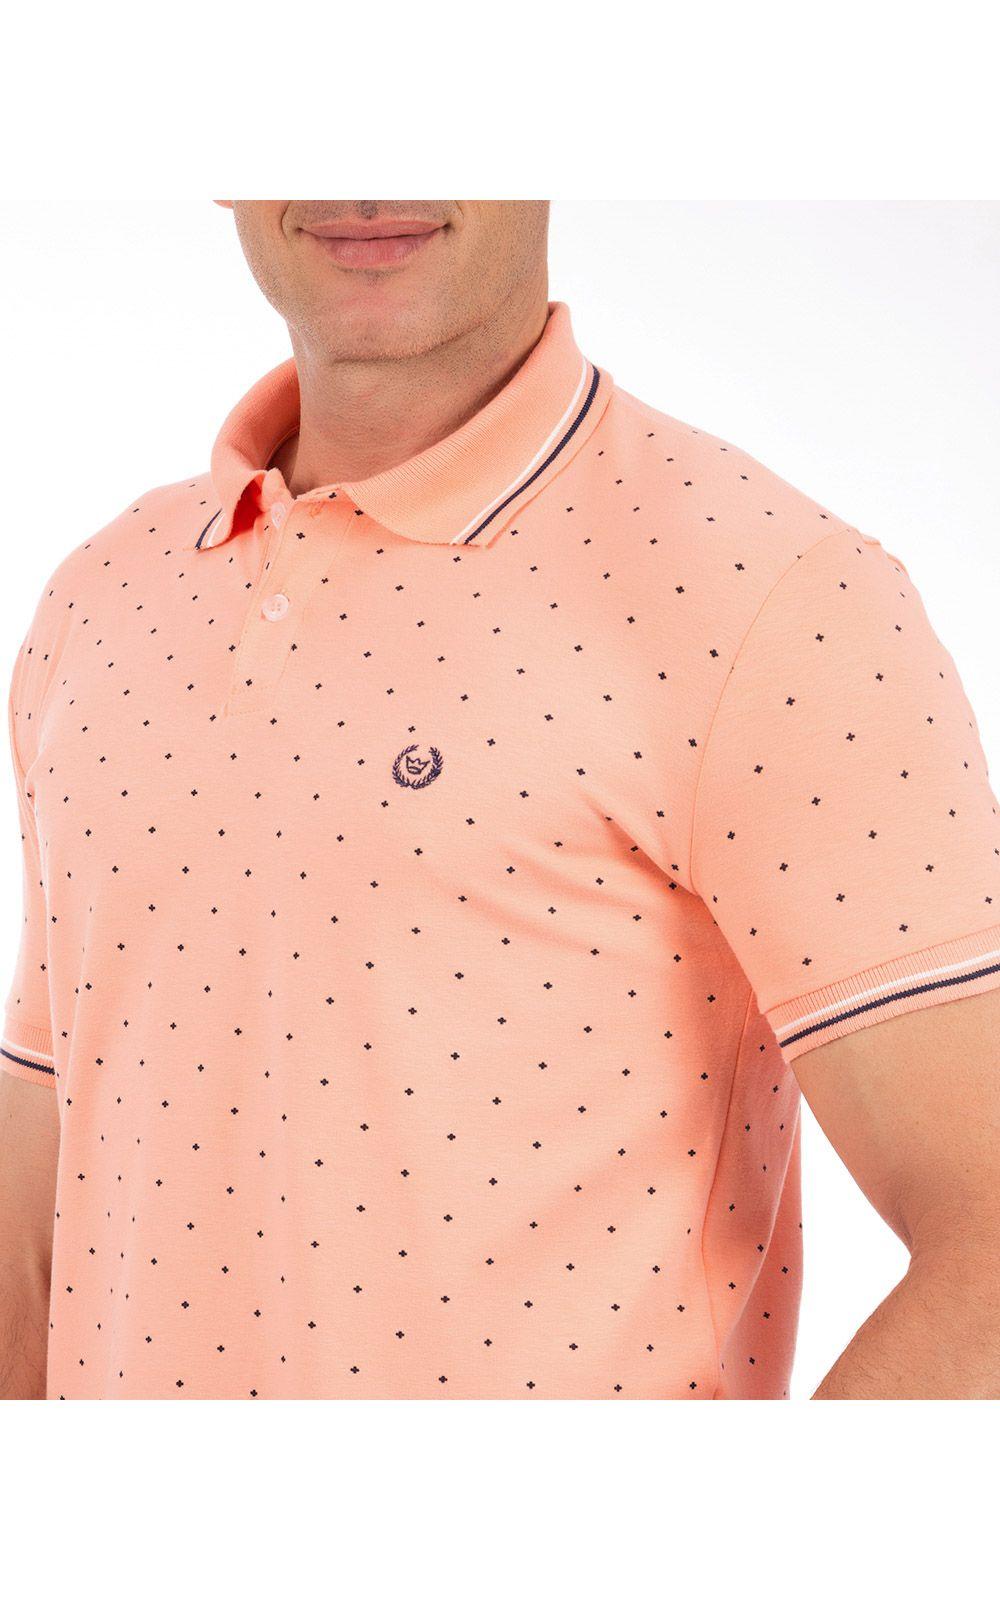 Foto 3 - Camisa Polo Masculina Laranja Estampada